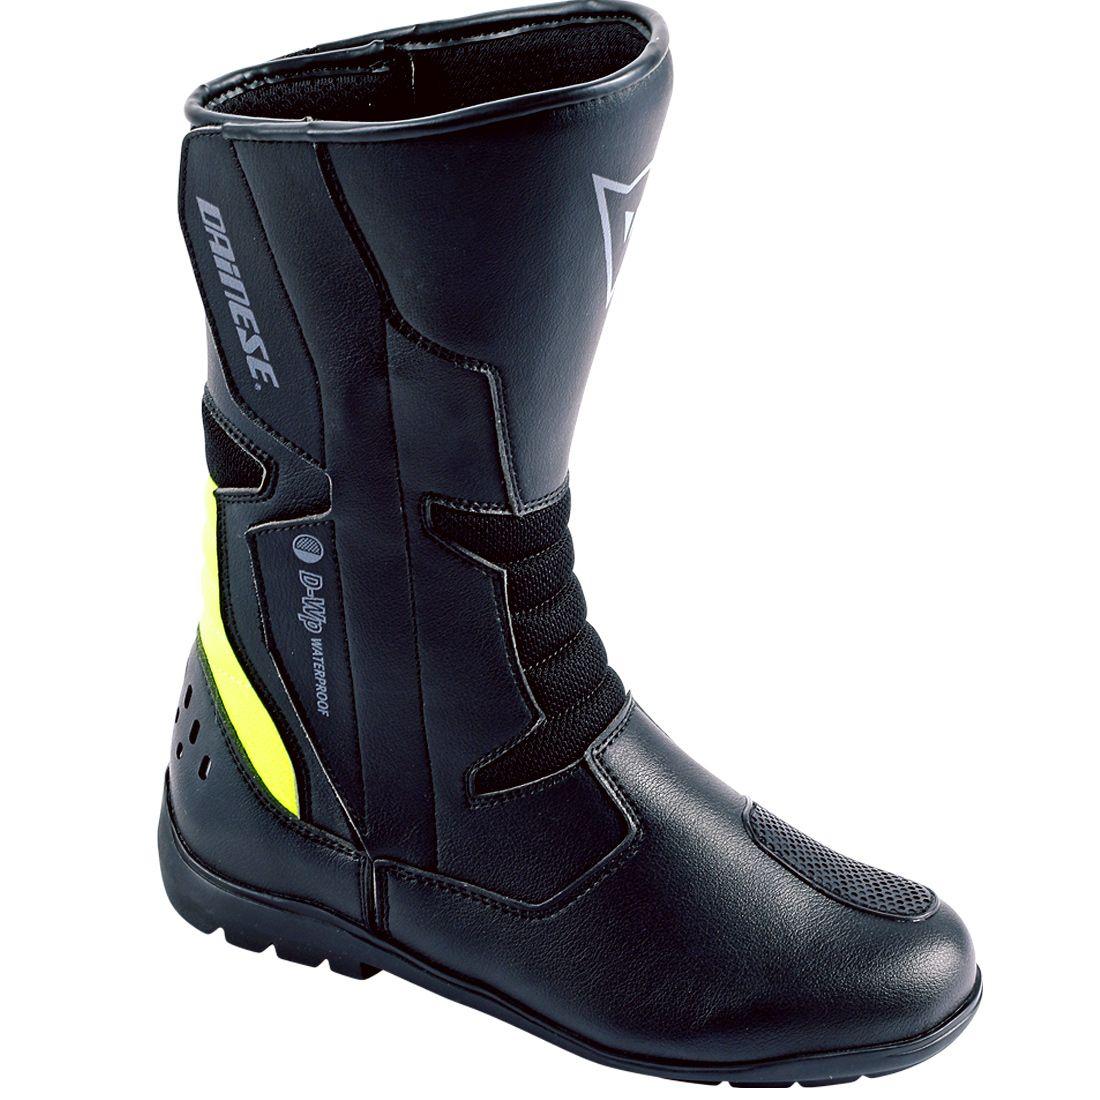 TEMPEST D-WP 車靴